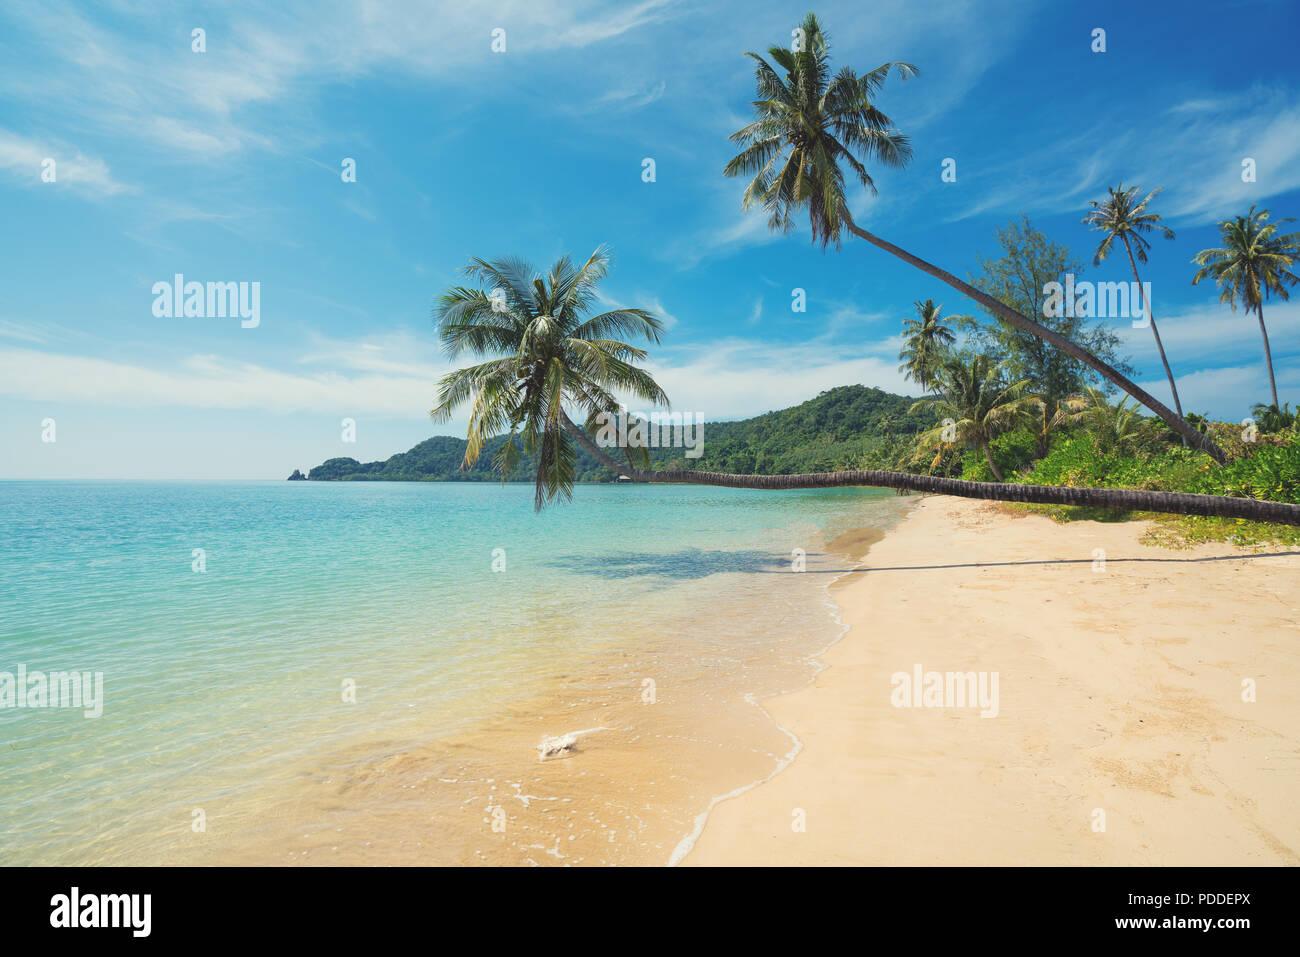 Coconut Palm Tree über Sommer Strand Meer in Phuket, Thailand. Sommer, Reisen, Ferien und Urlaub Konzept Stockbild